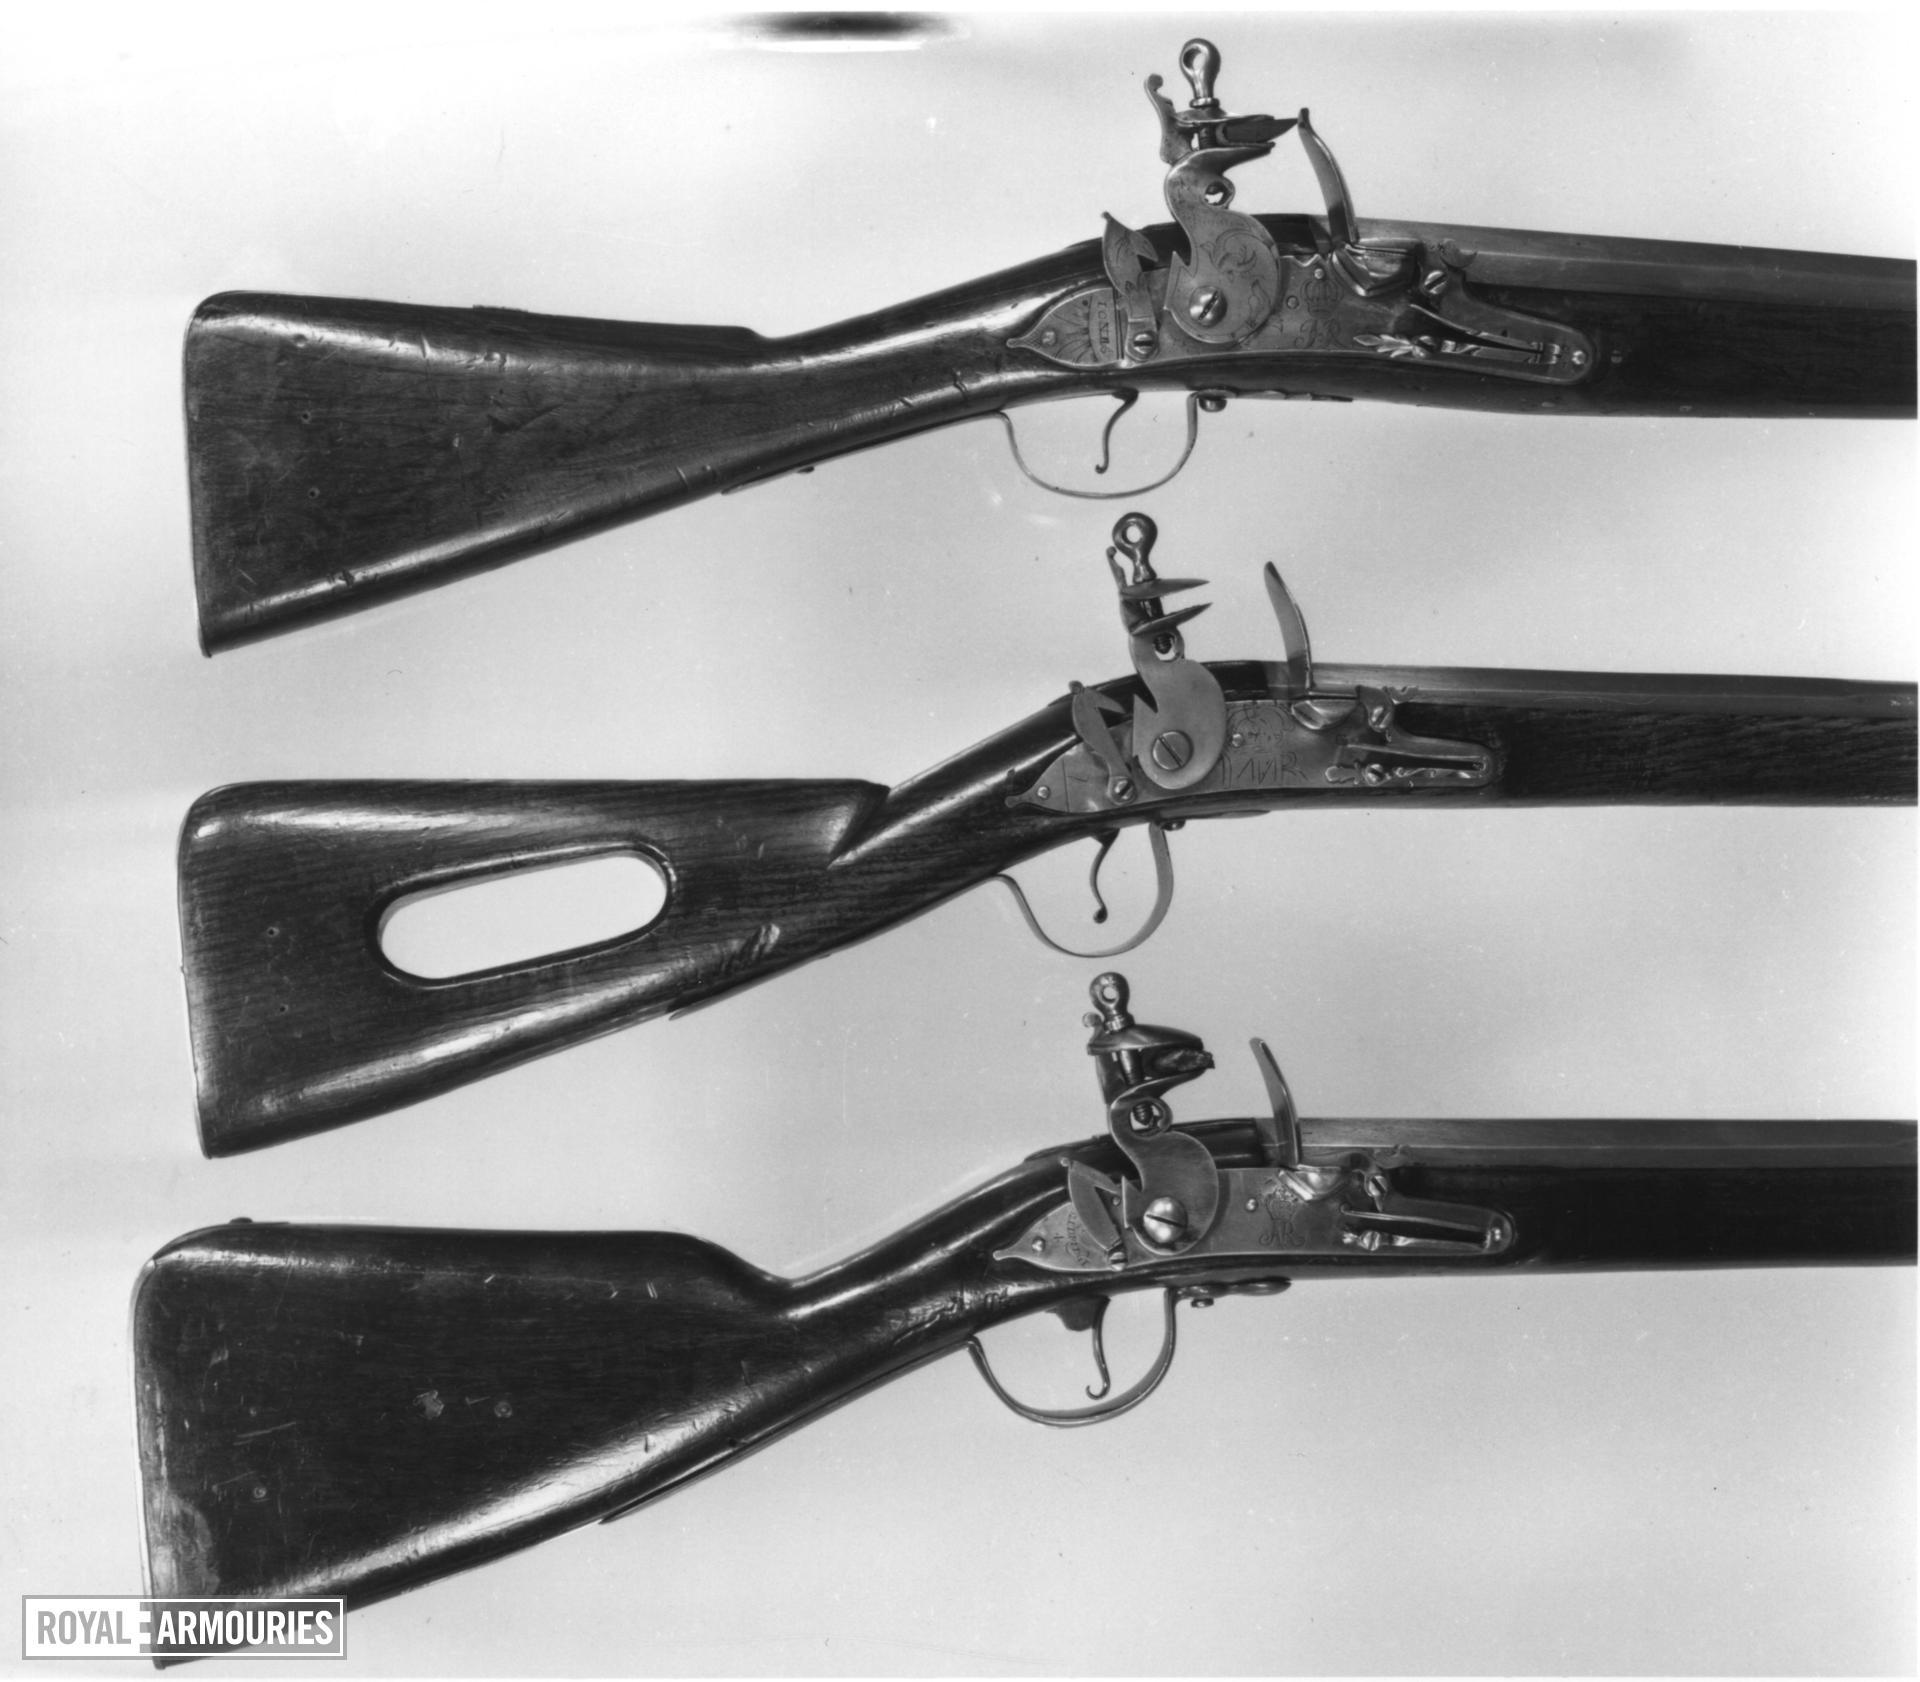 Flintlock muzzle-loading musket - James II Land Service